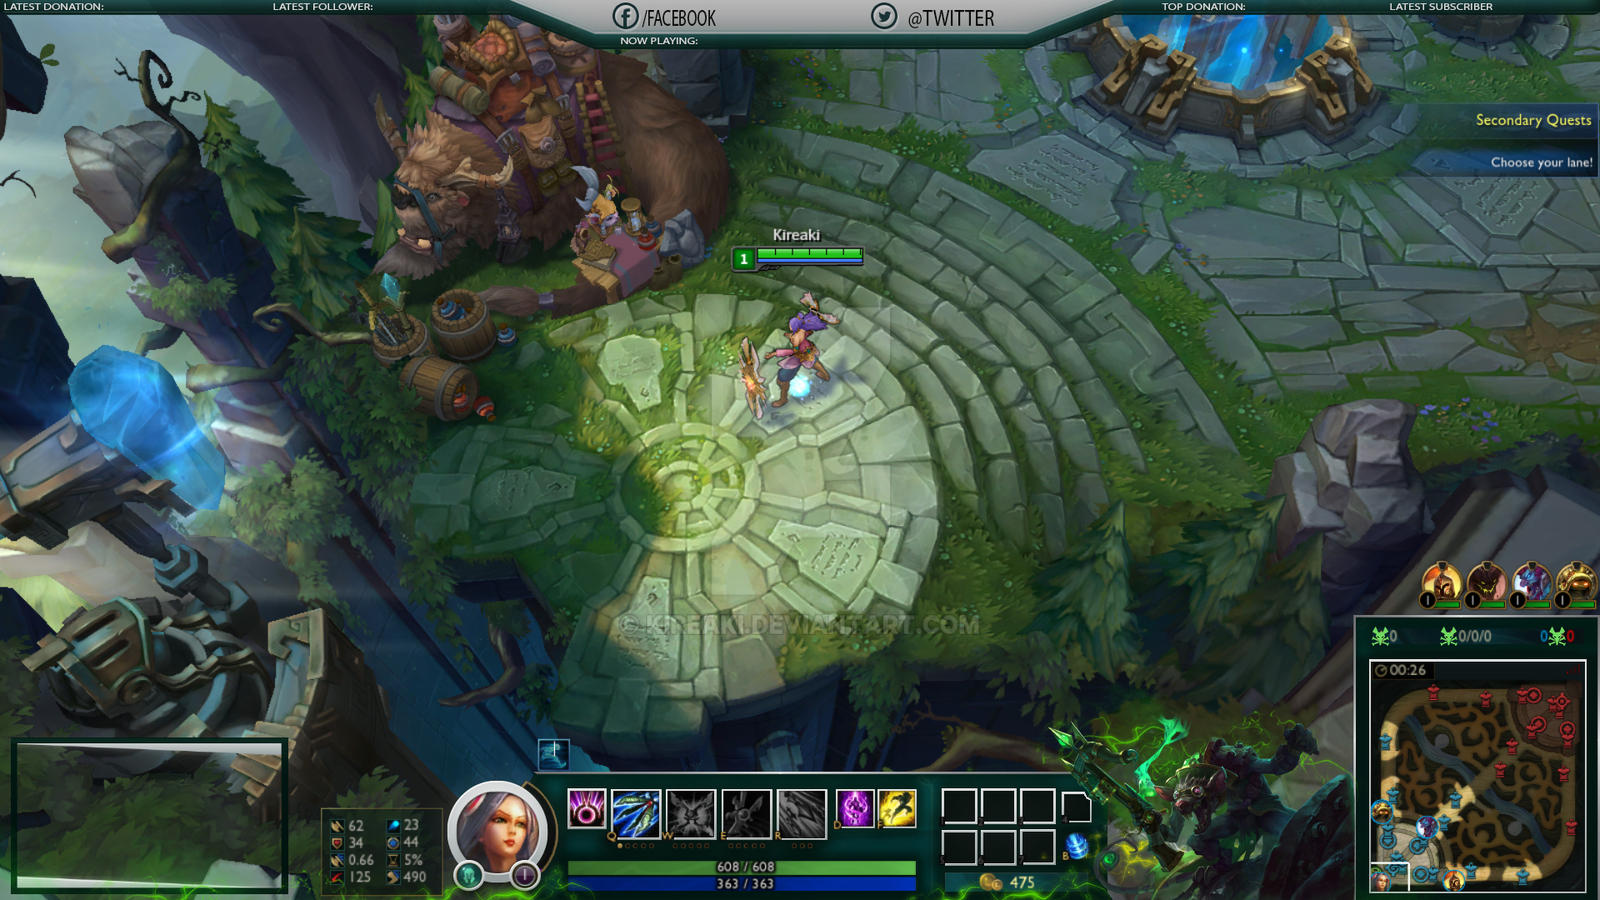 New Hud League Of Legends Overlay By Kireaki On Deviantart